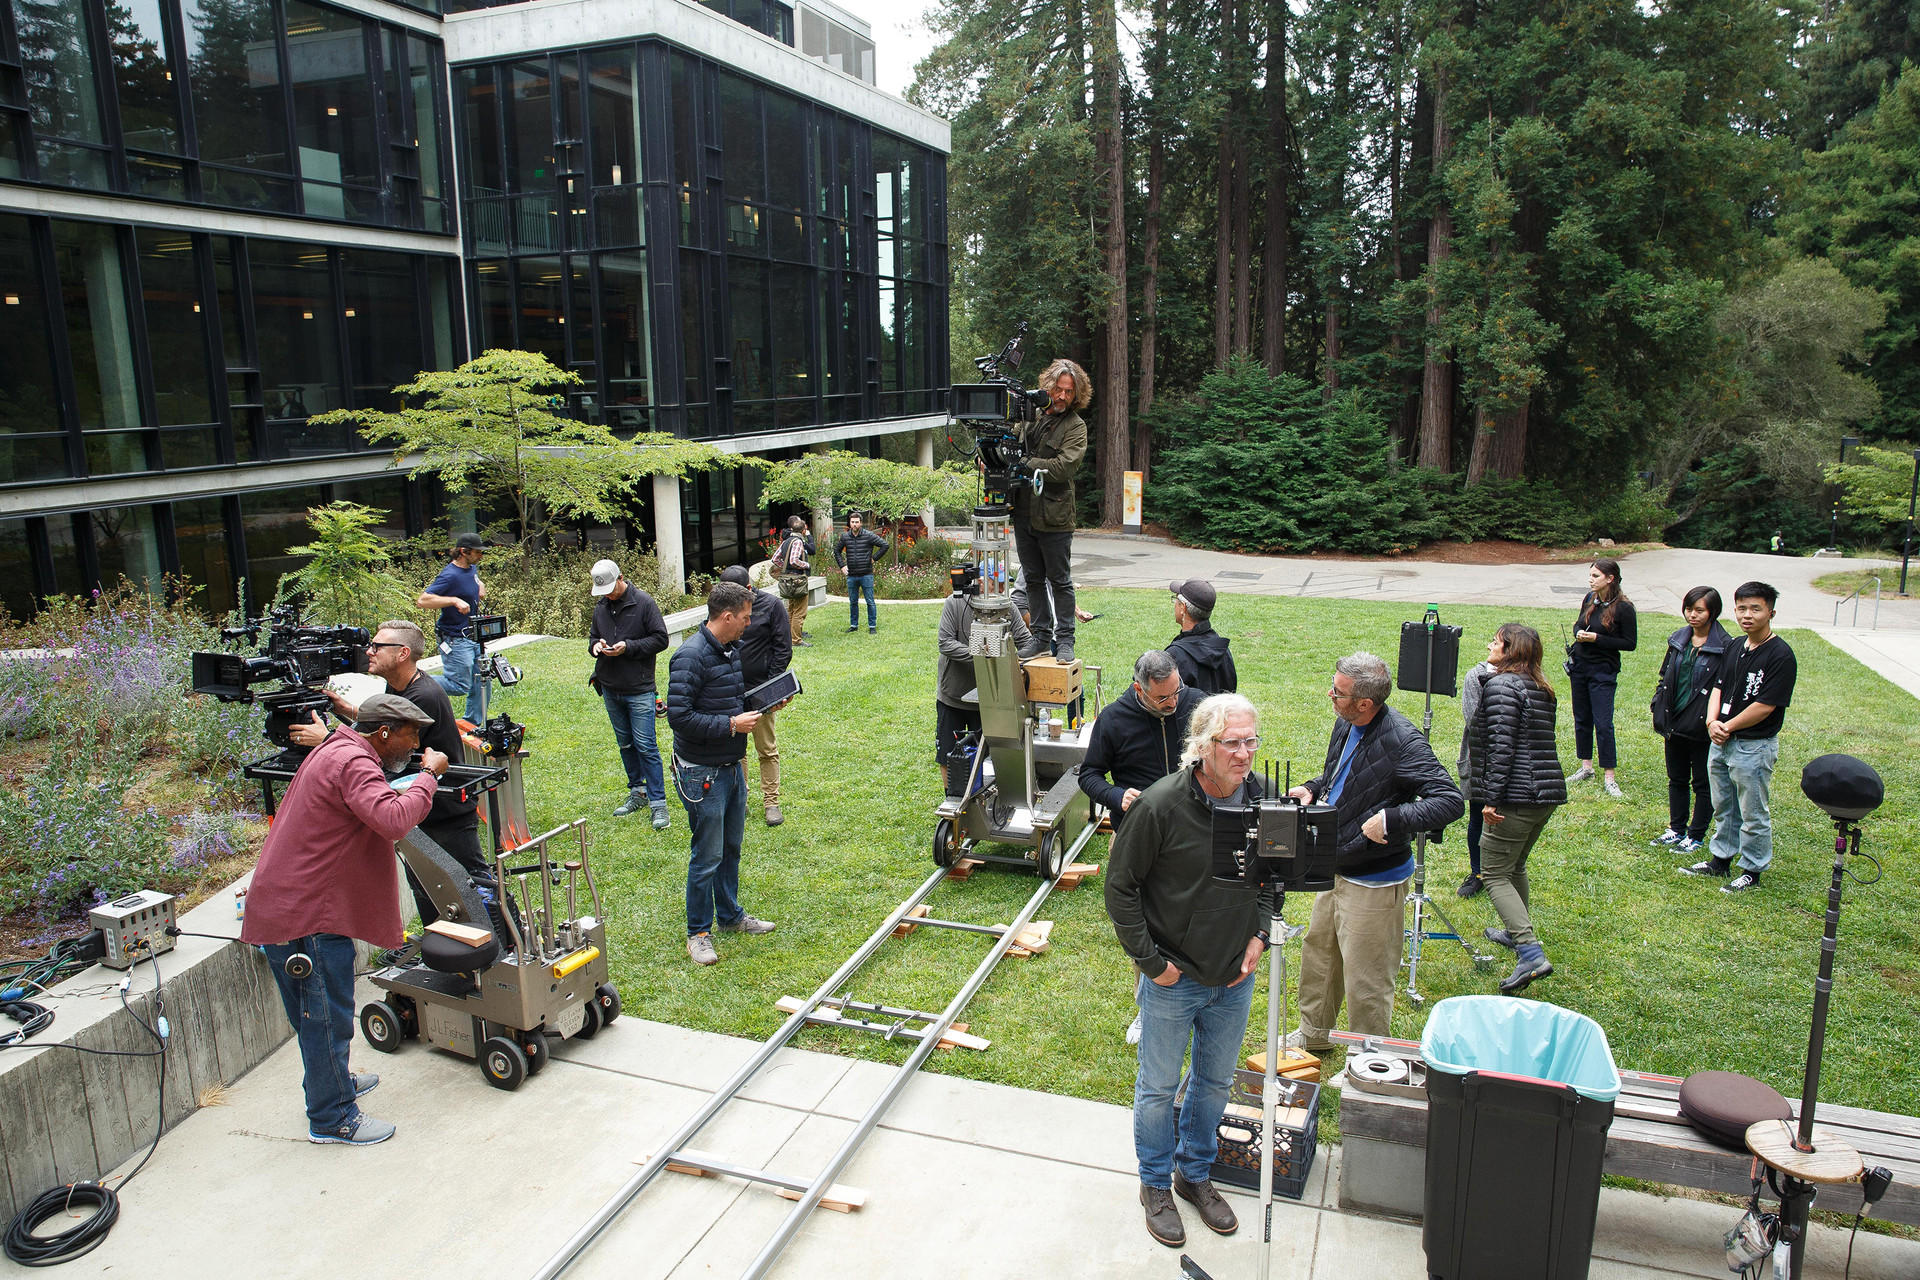 The crew of the FX TV series Devs shoots a scene on the campus of UC Santa Cruz